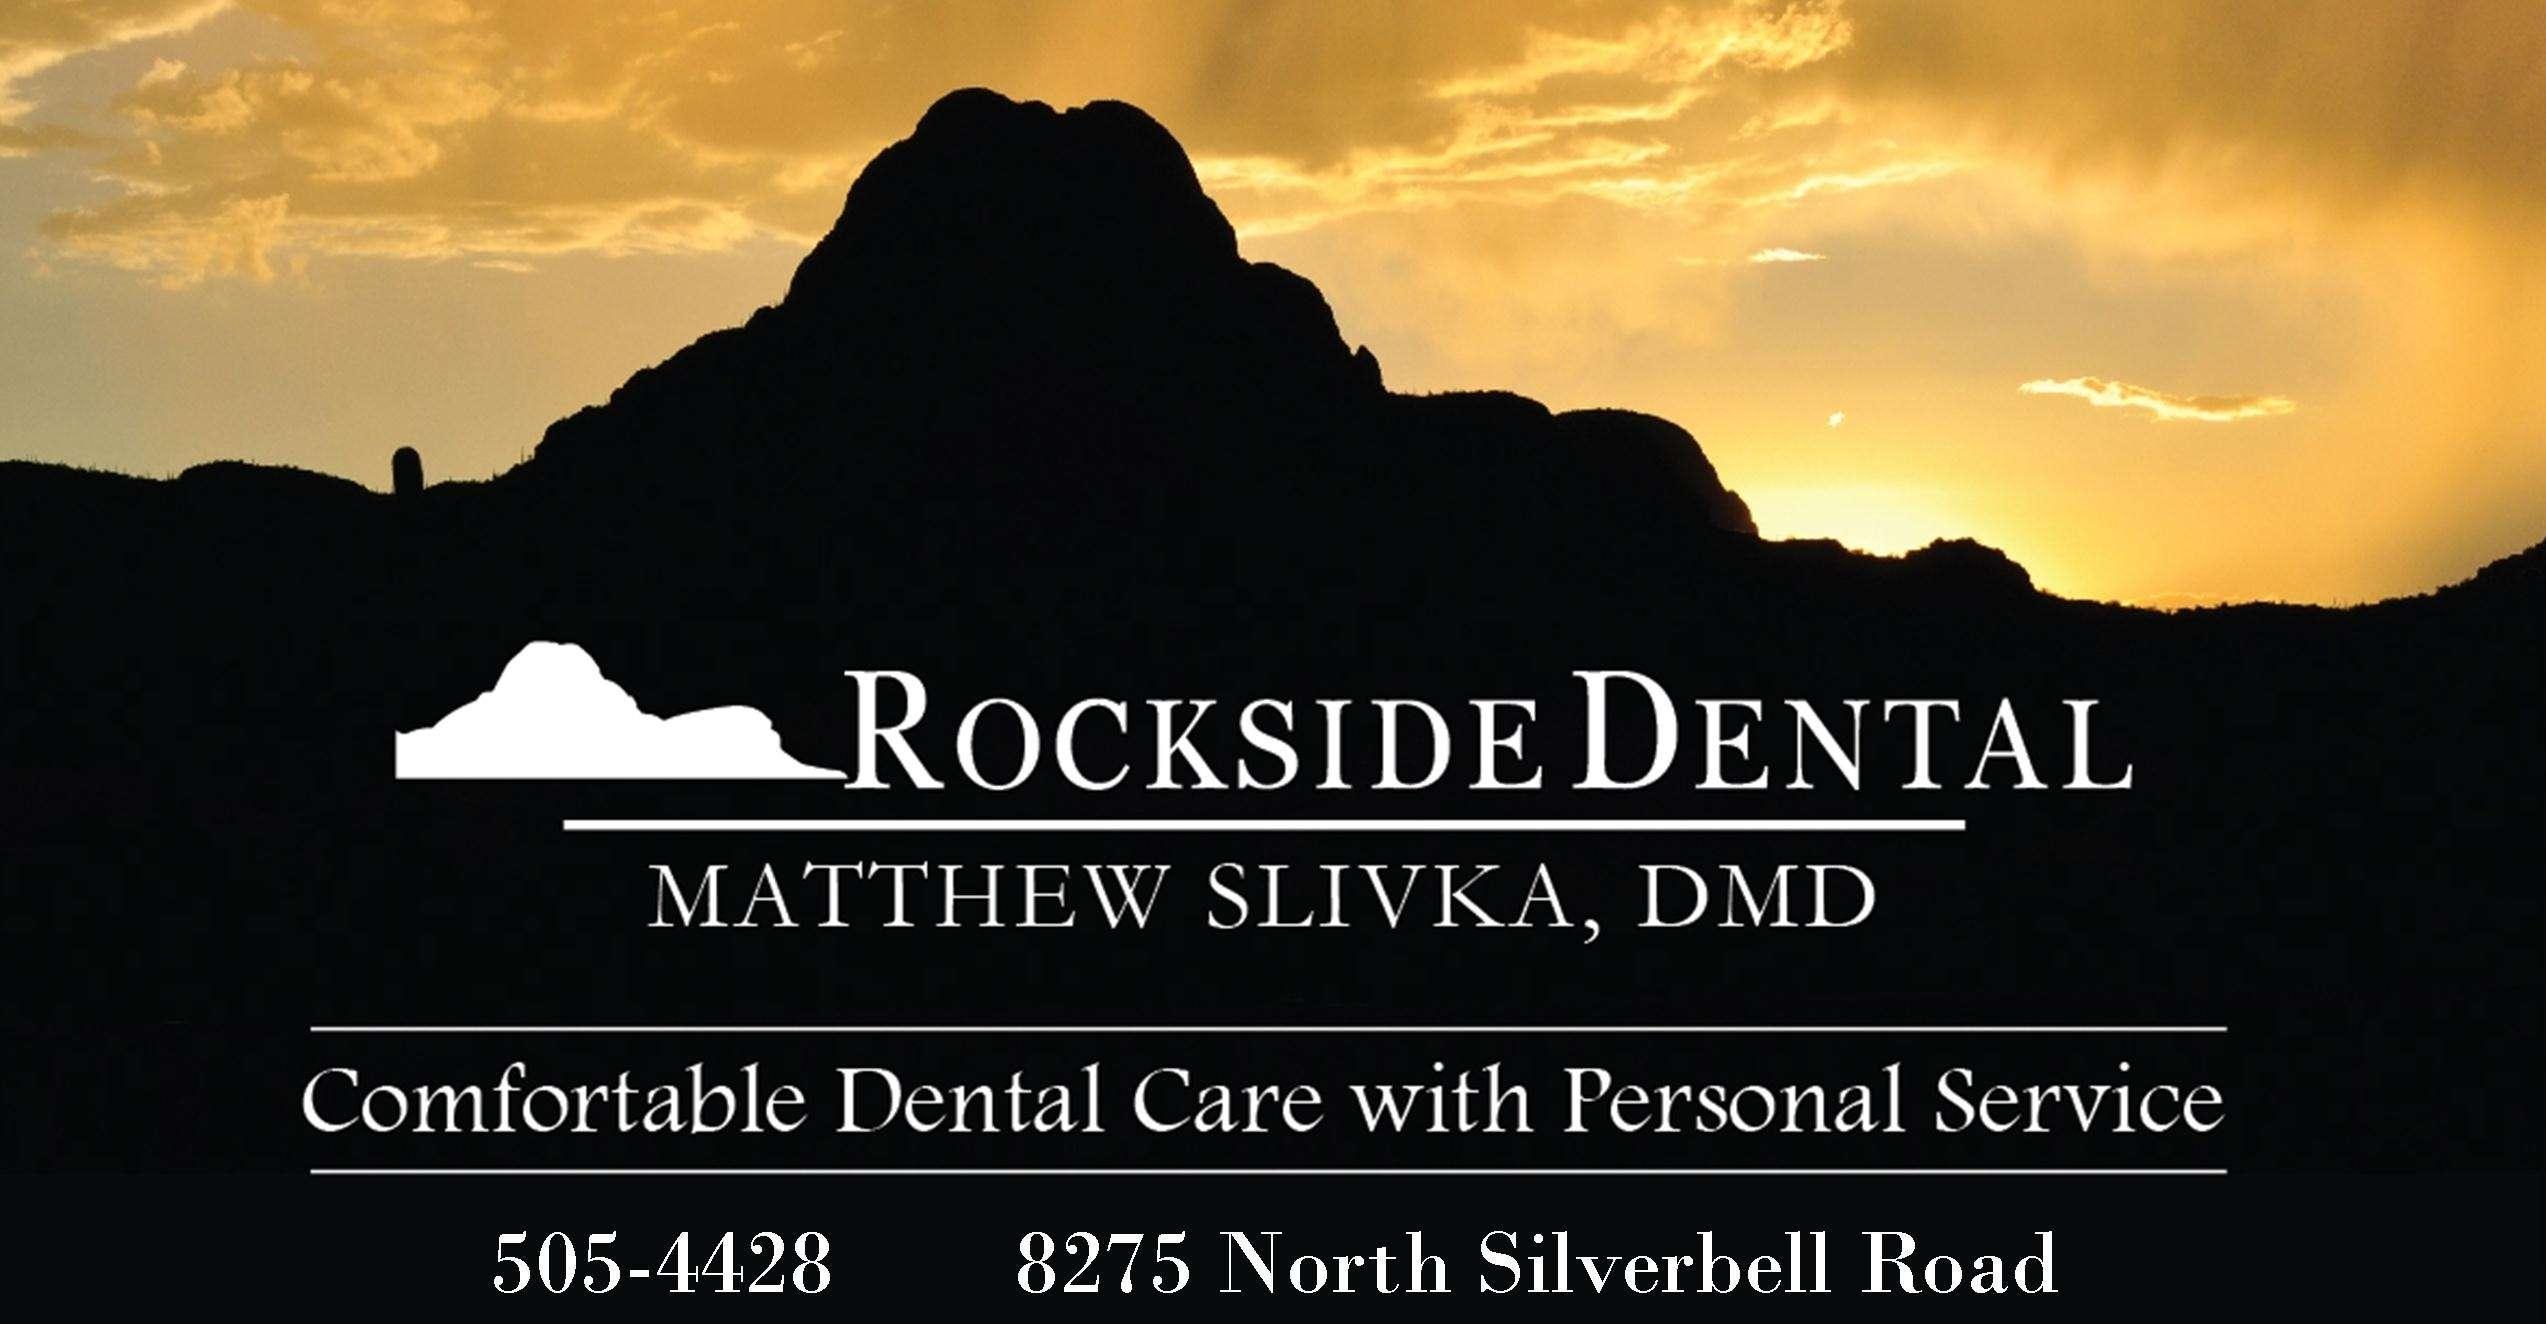 Rockside Dental